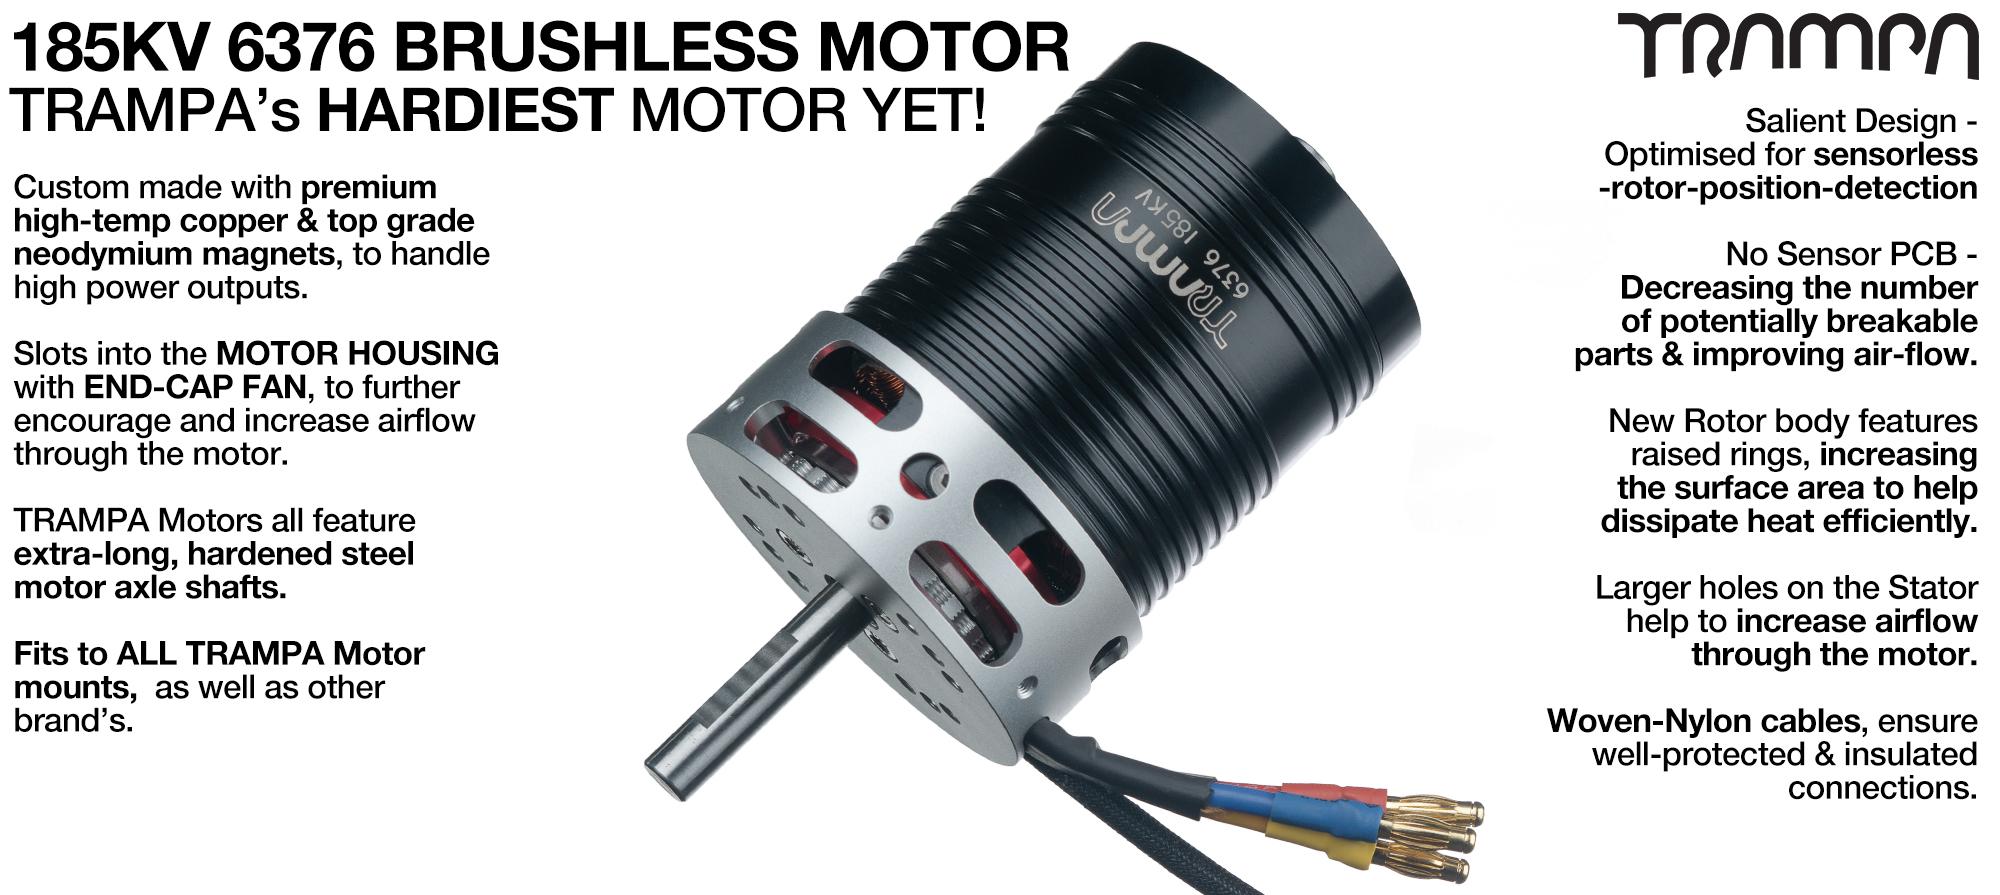 TRAMPA's own 6376 185Kv 3800w DC Brushless Motor - 300mm Sensor Cables Box